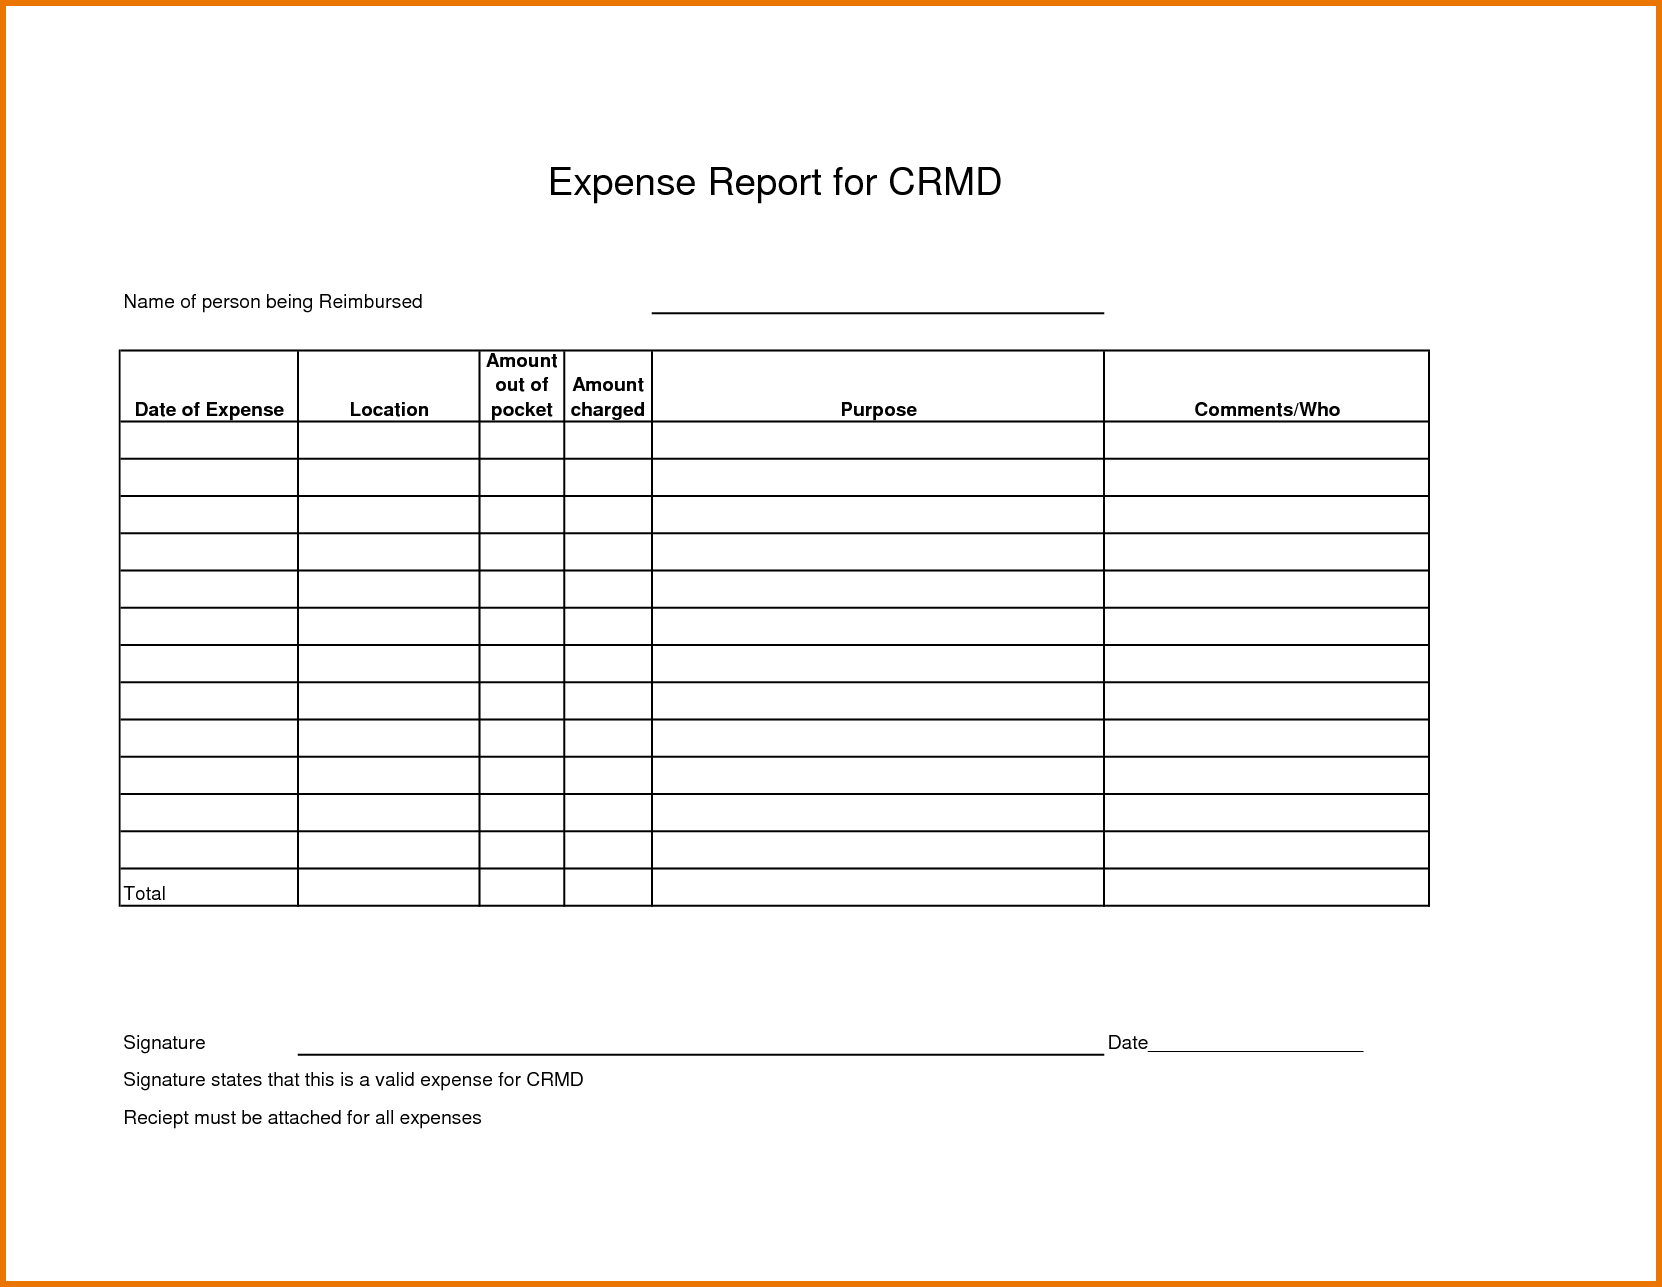 Scope Of Work Spreadsheet Within Expense Report Spreadsheet Template And Expense Report Templates